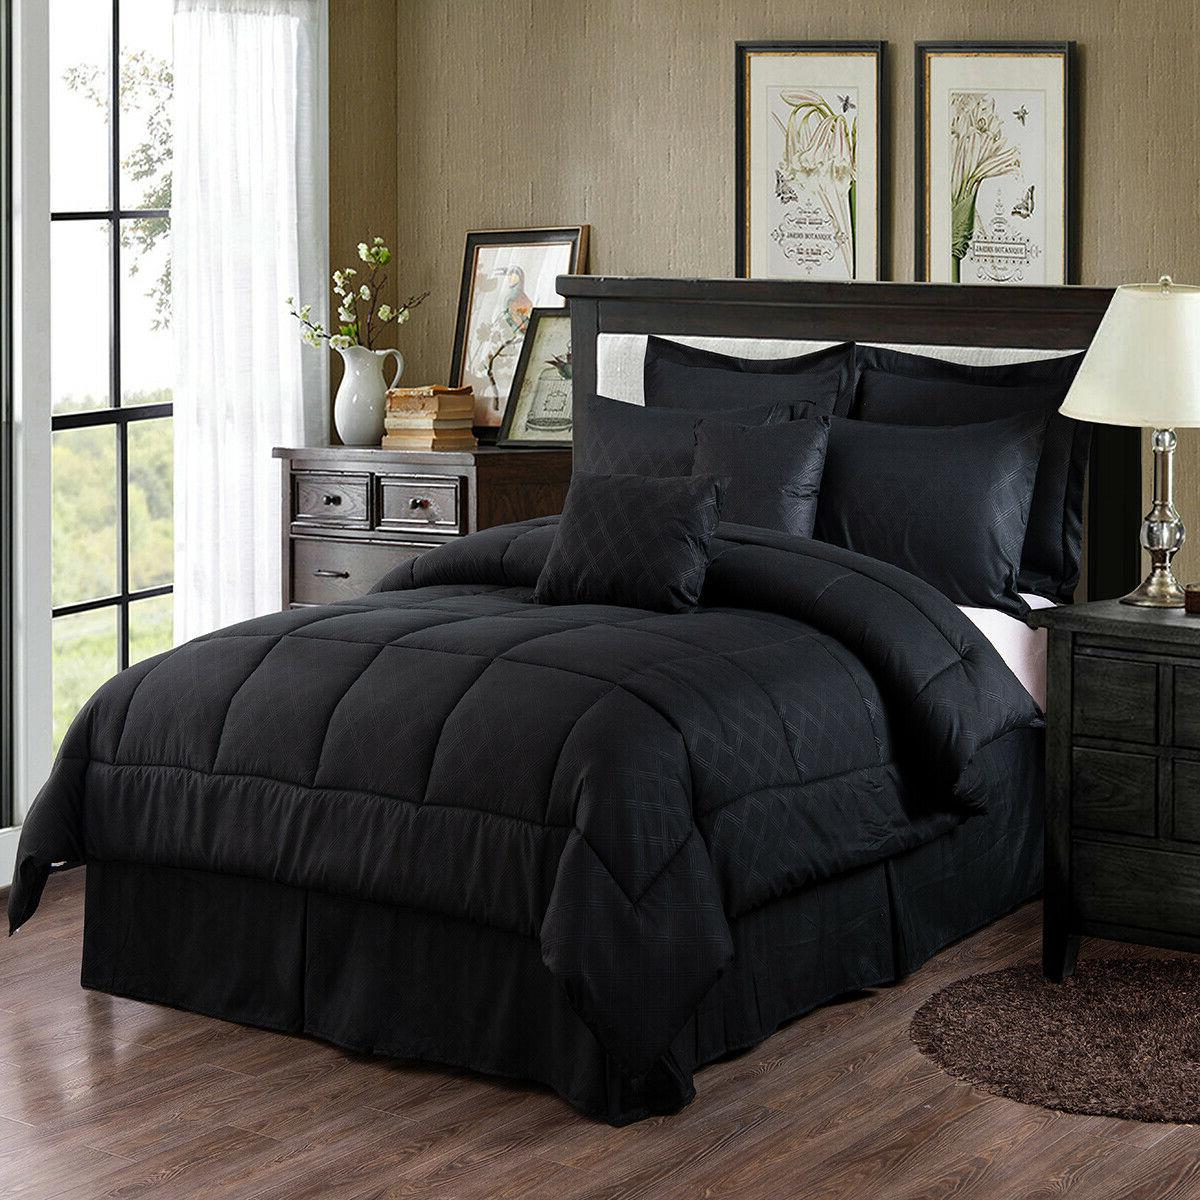 Deal 10 Piece Comforter Set Complete Bed in a Bag Comforter